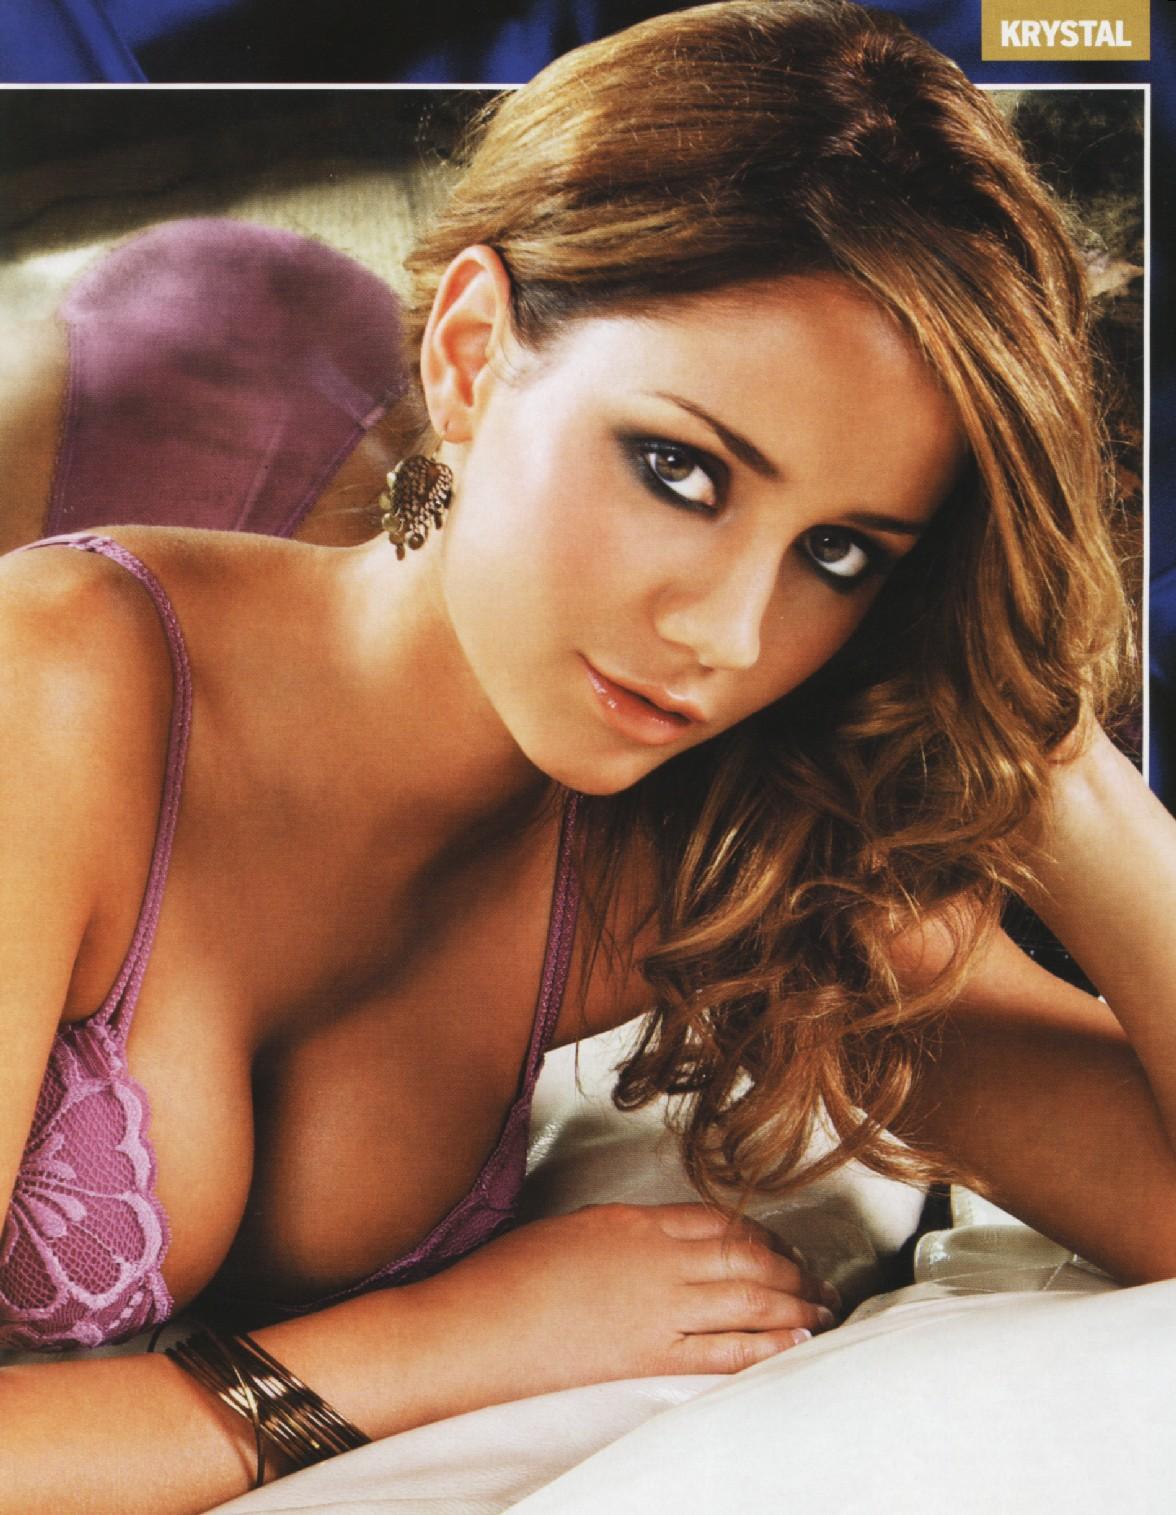 Krystal Forscutt sexy pic